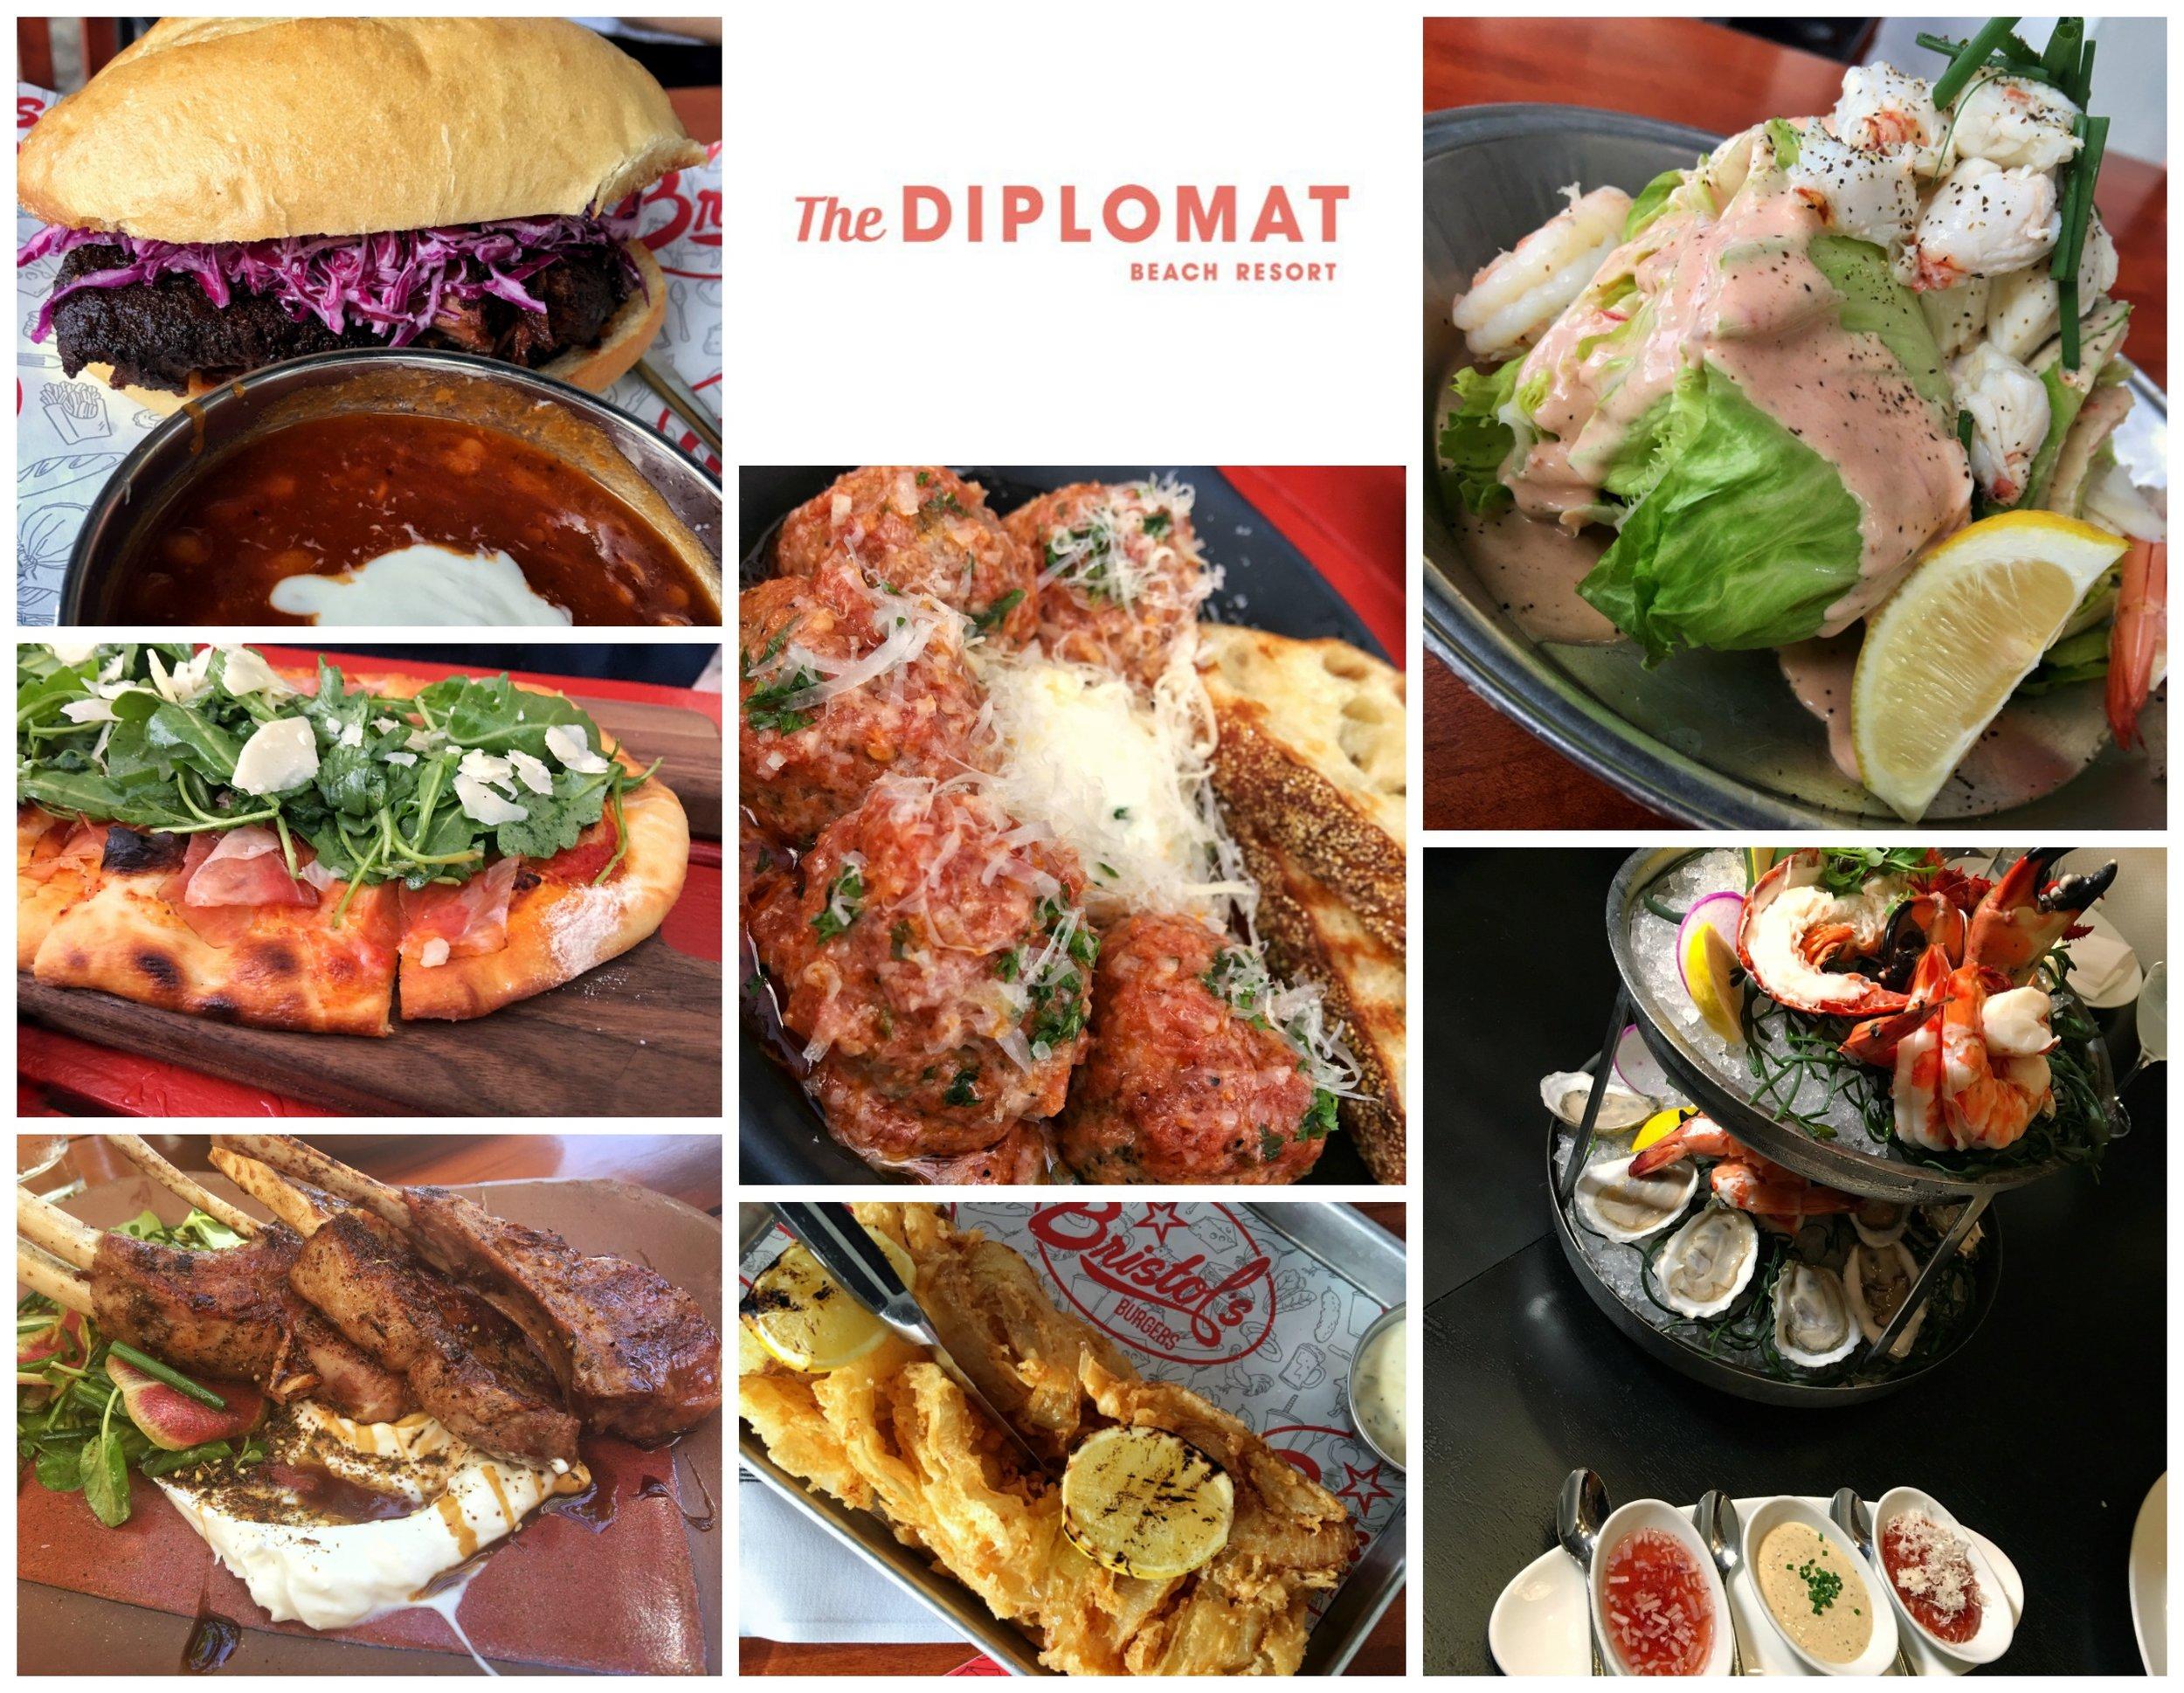 Diplomat Resort Hollywood dining options